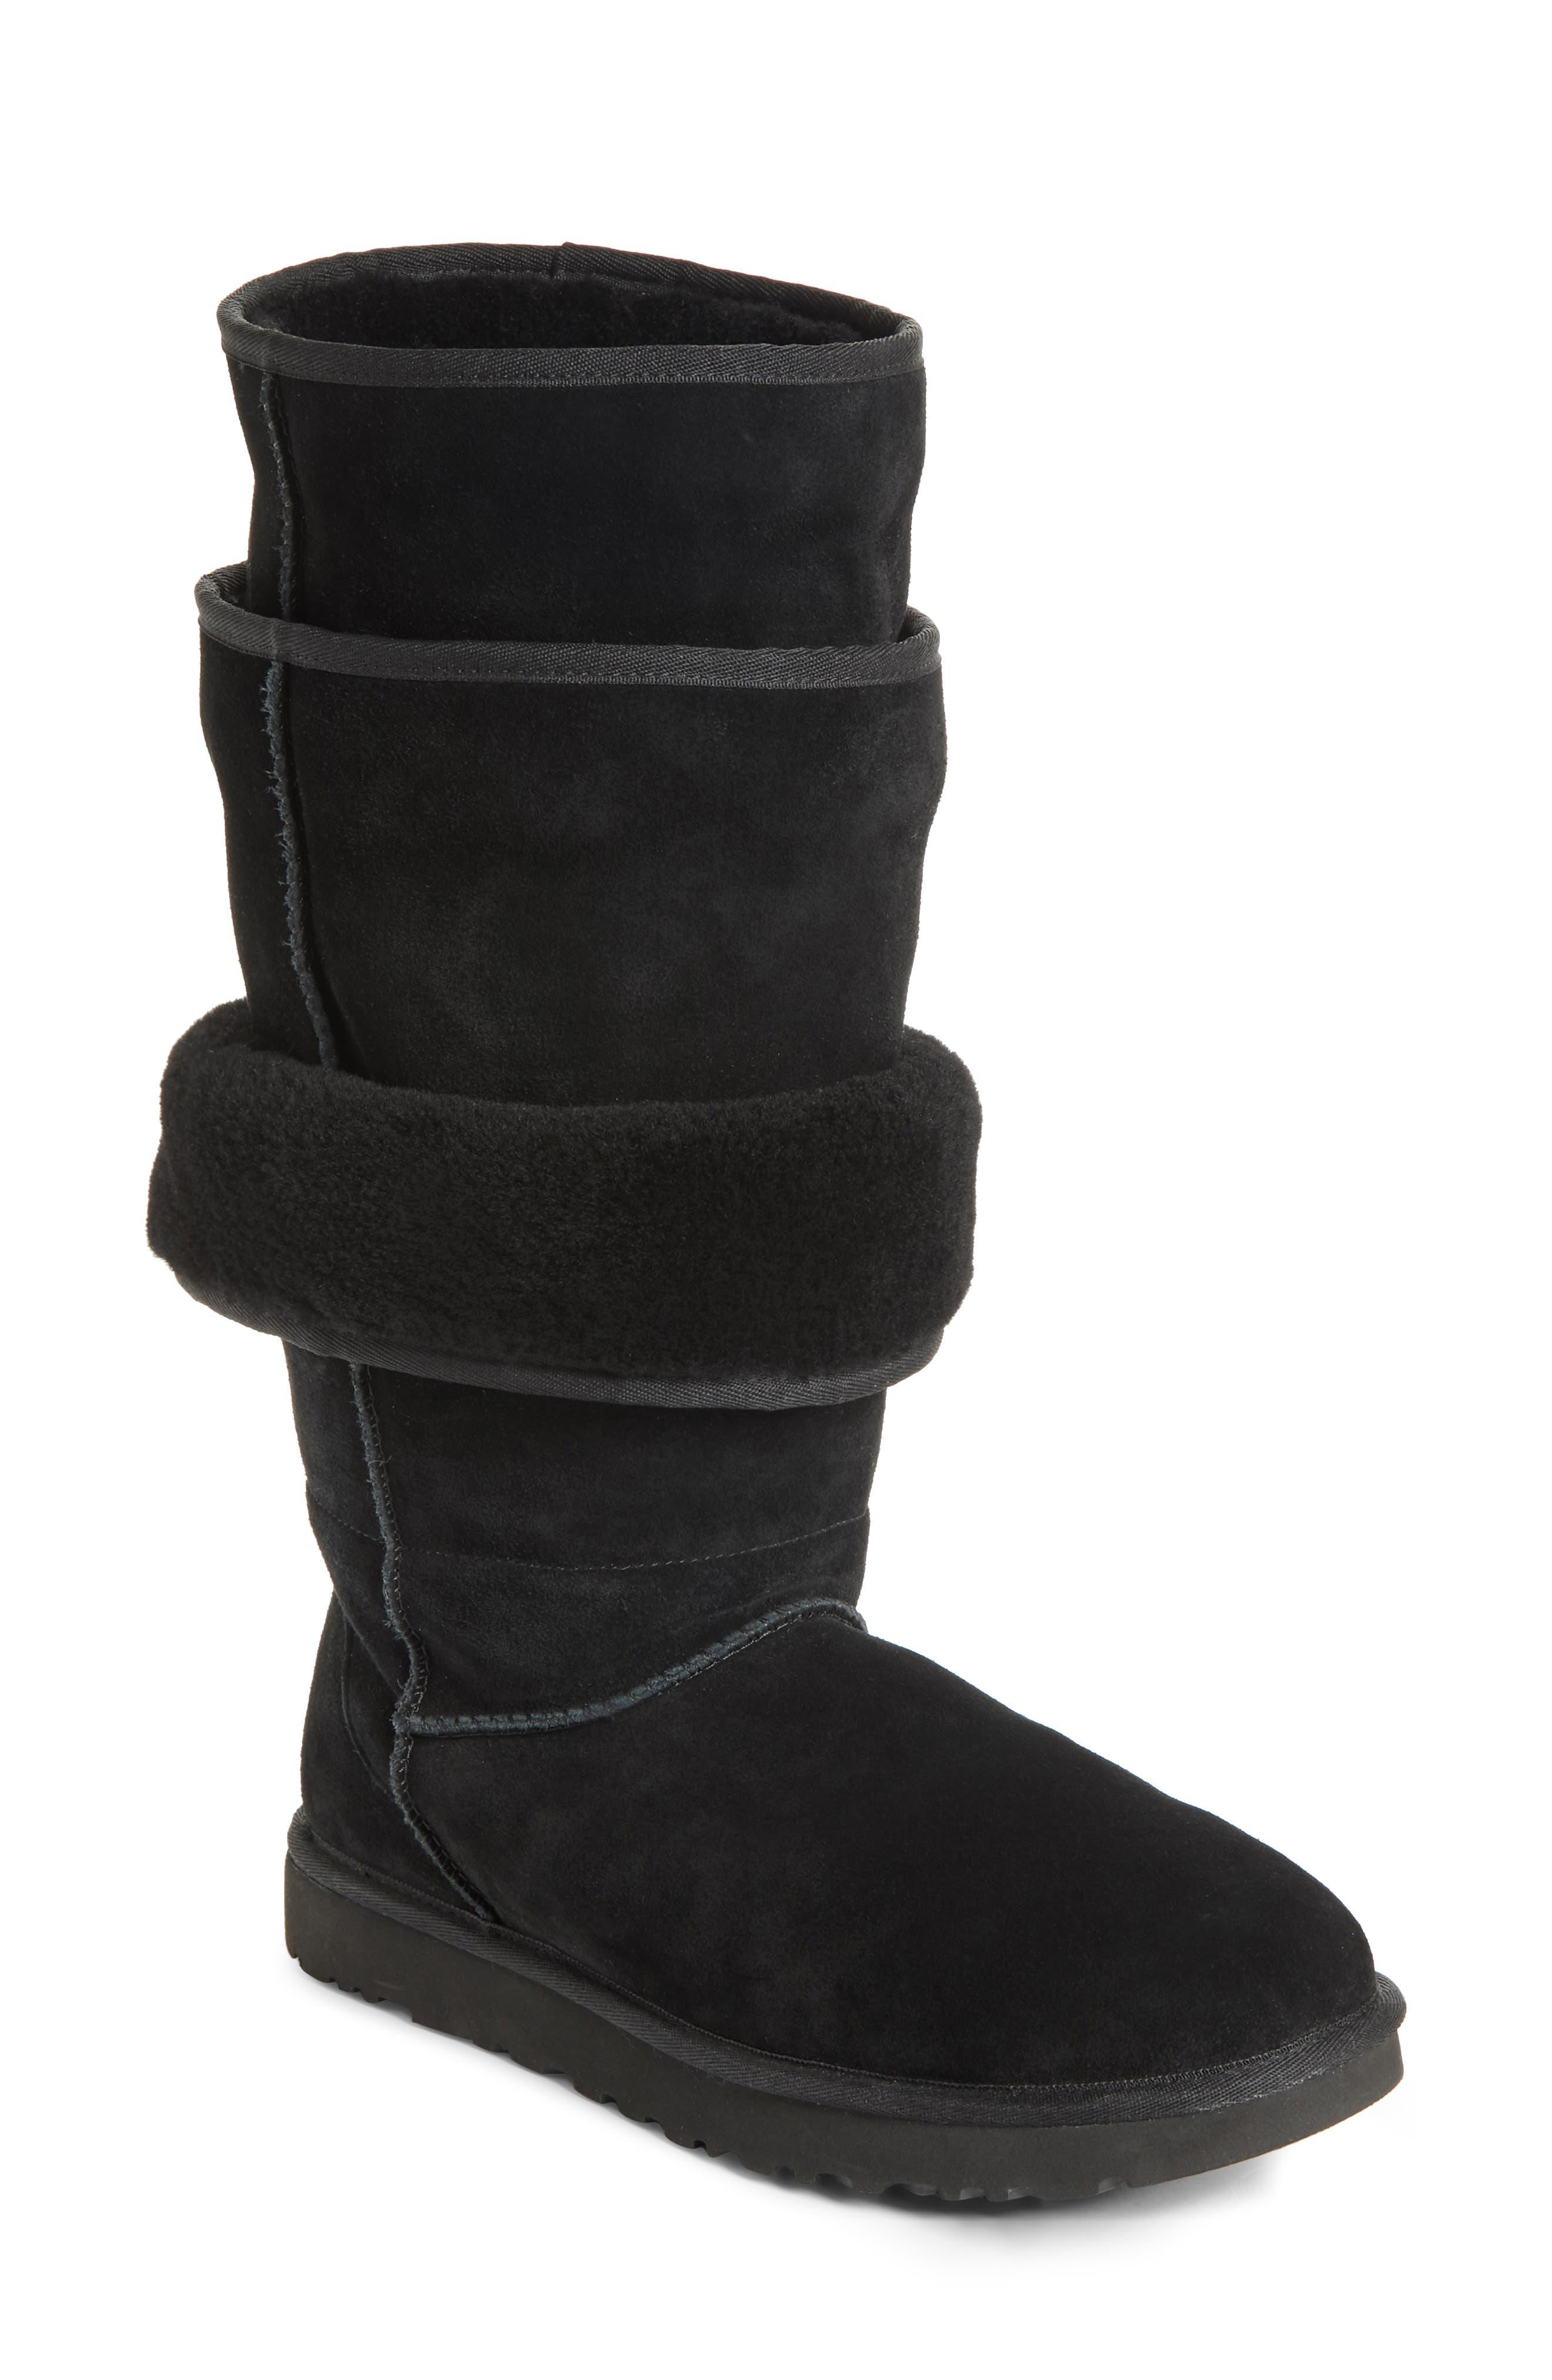 x UGG<sup>®</sup> Layered Boot,                             Main thumbnail 1, color,                             NOIR